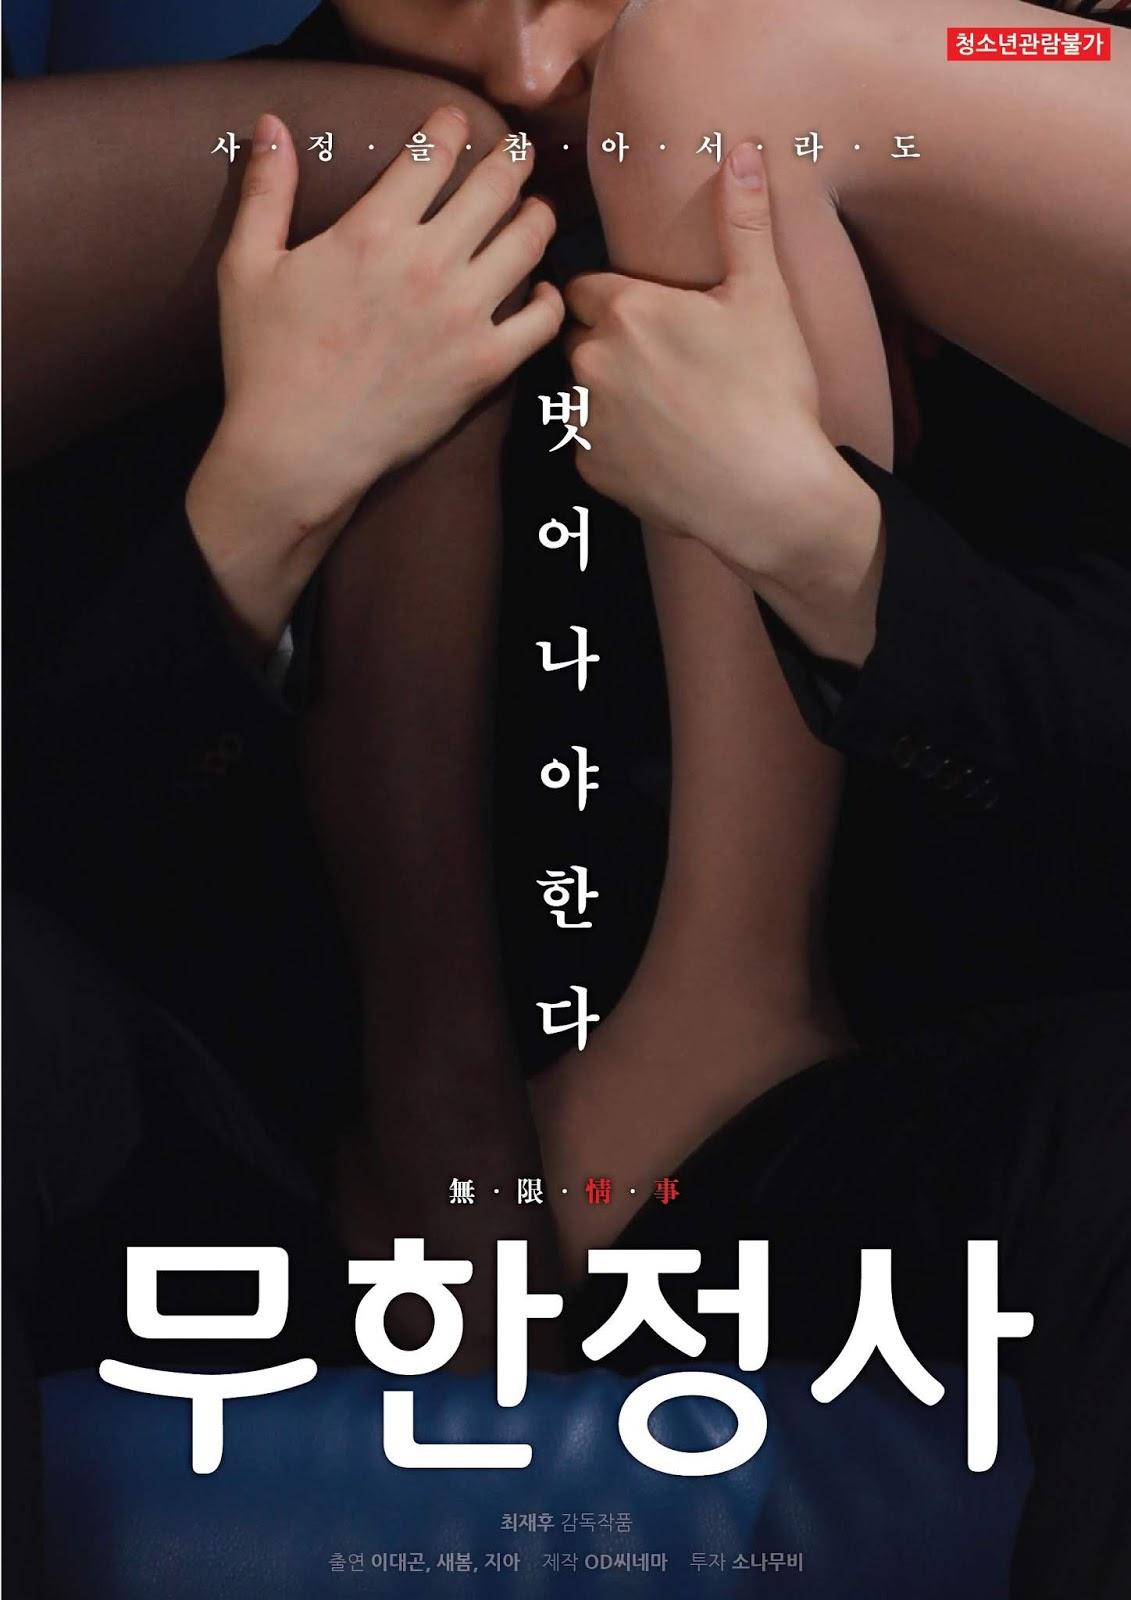 Infinite Sex Full Korea 18+ Adult Movie Online Free